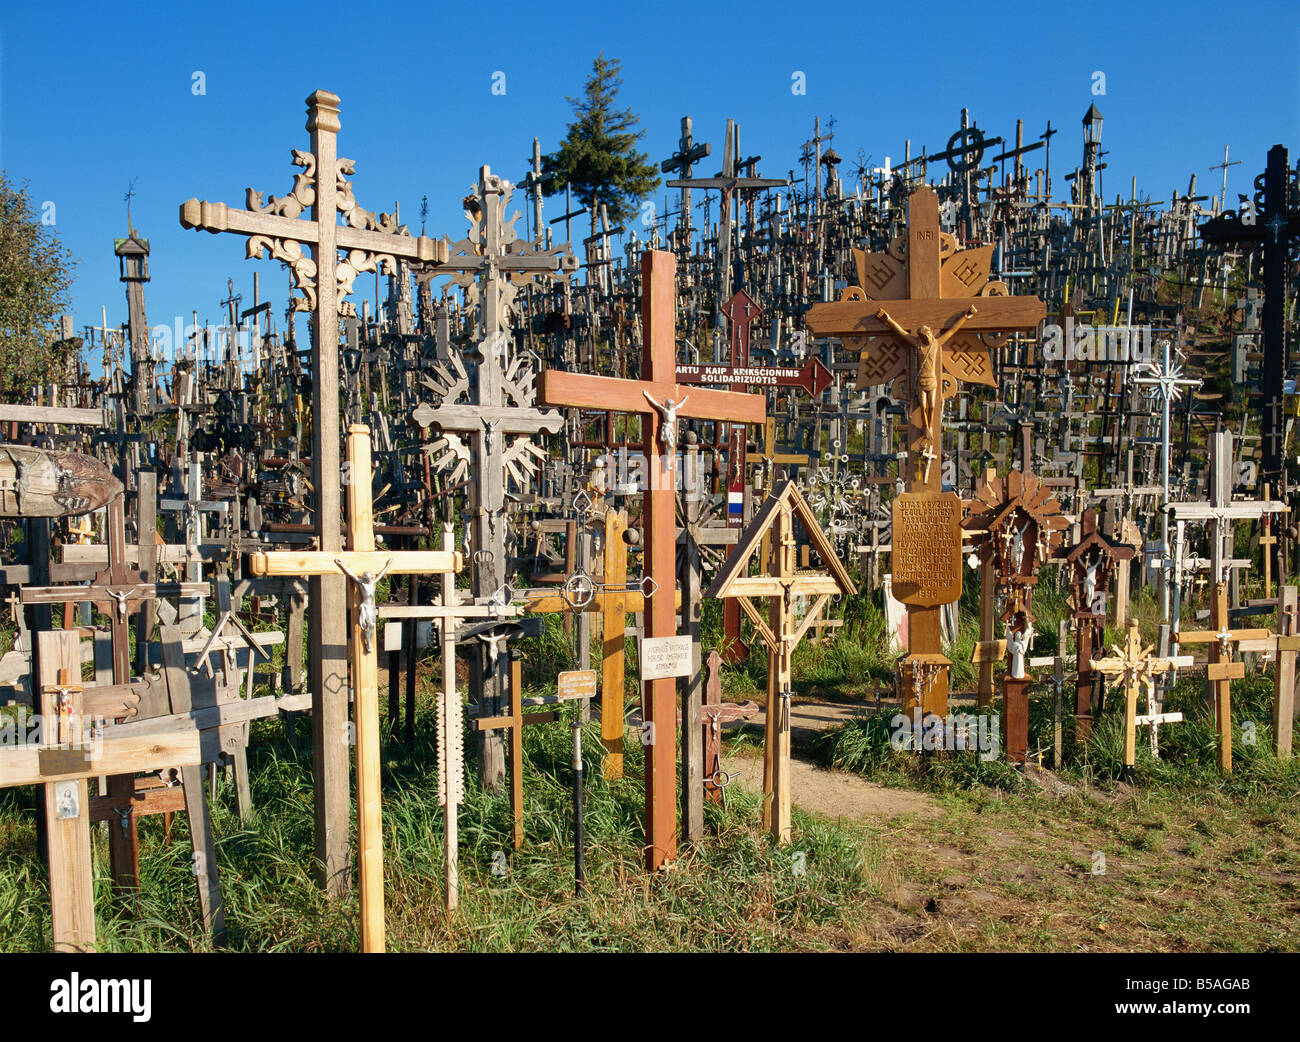 Kryziu Kalnas (Hill of Crosses), in the Siauliai area of Lithuania, Baltic States, Europe Stock Photo